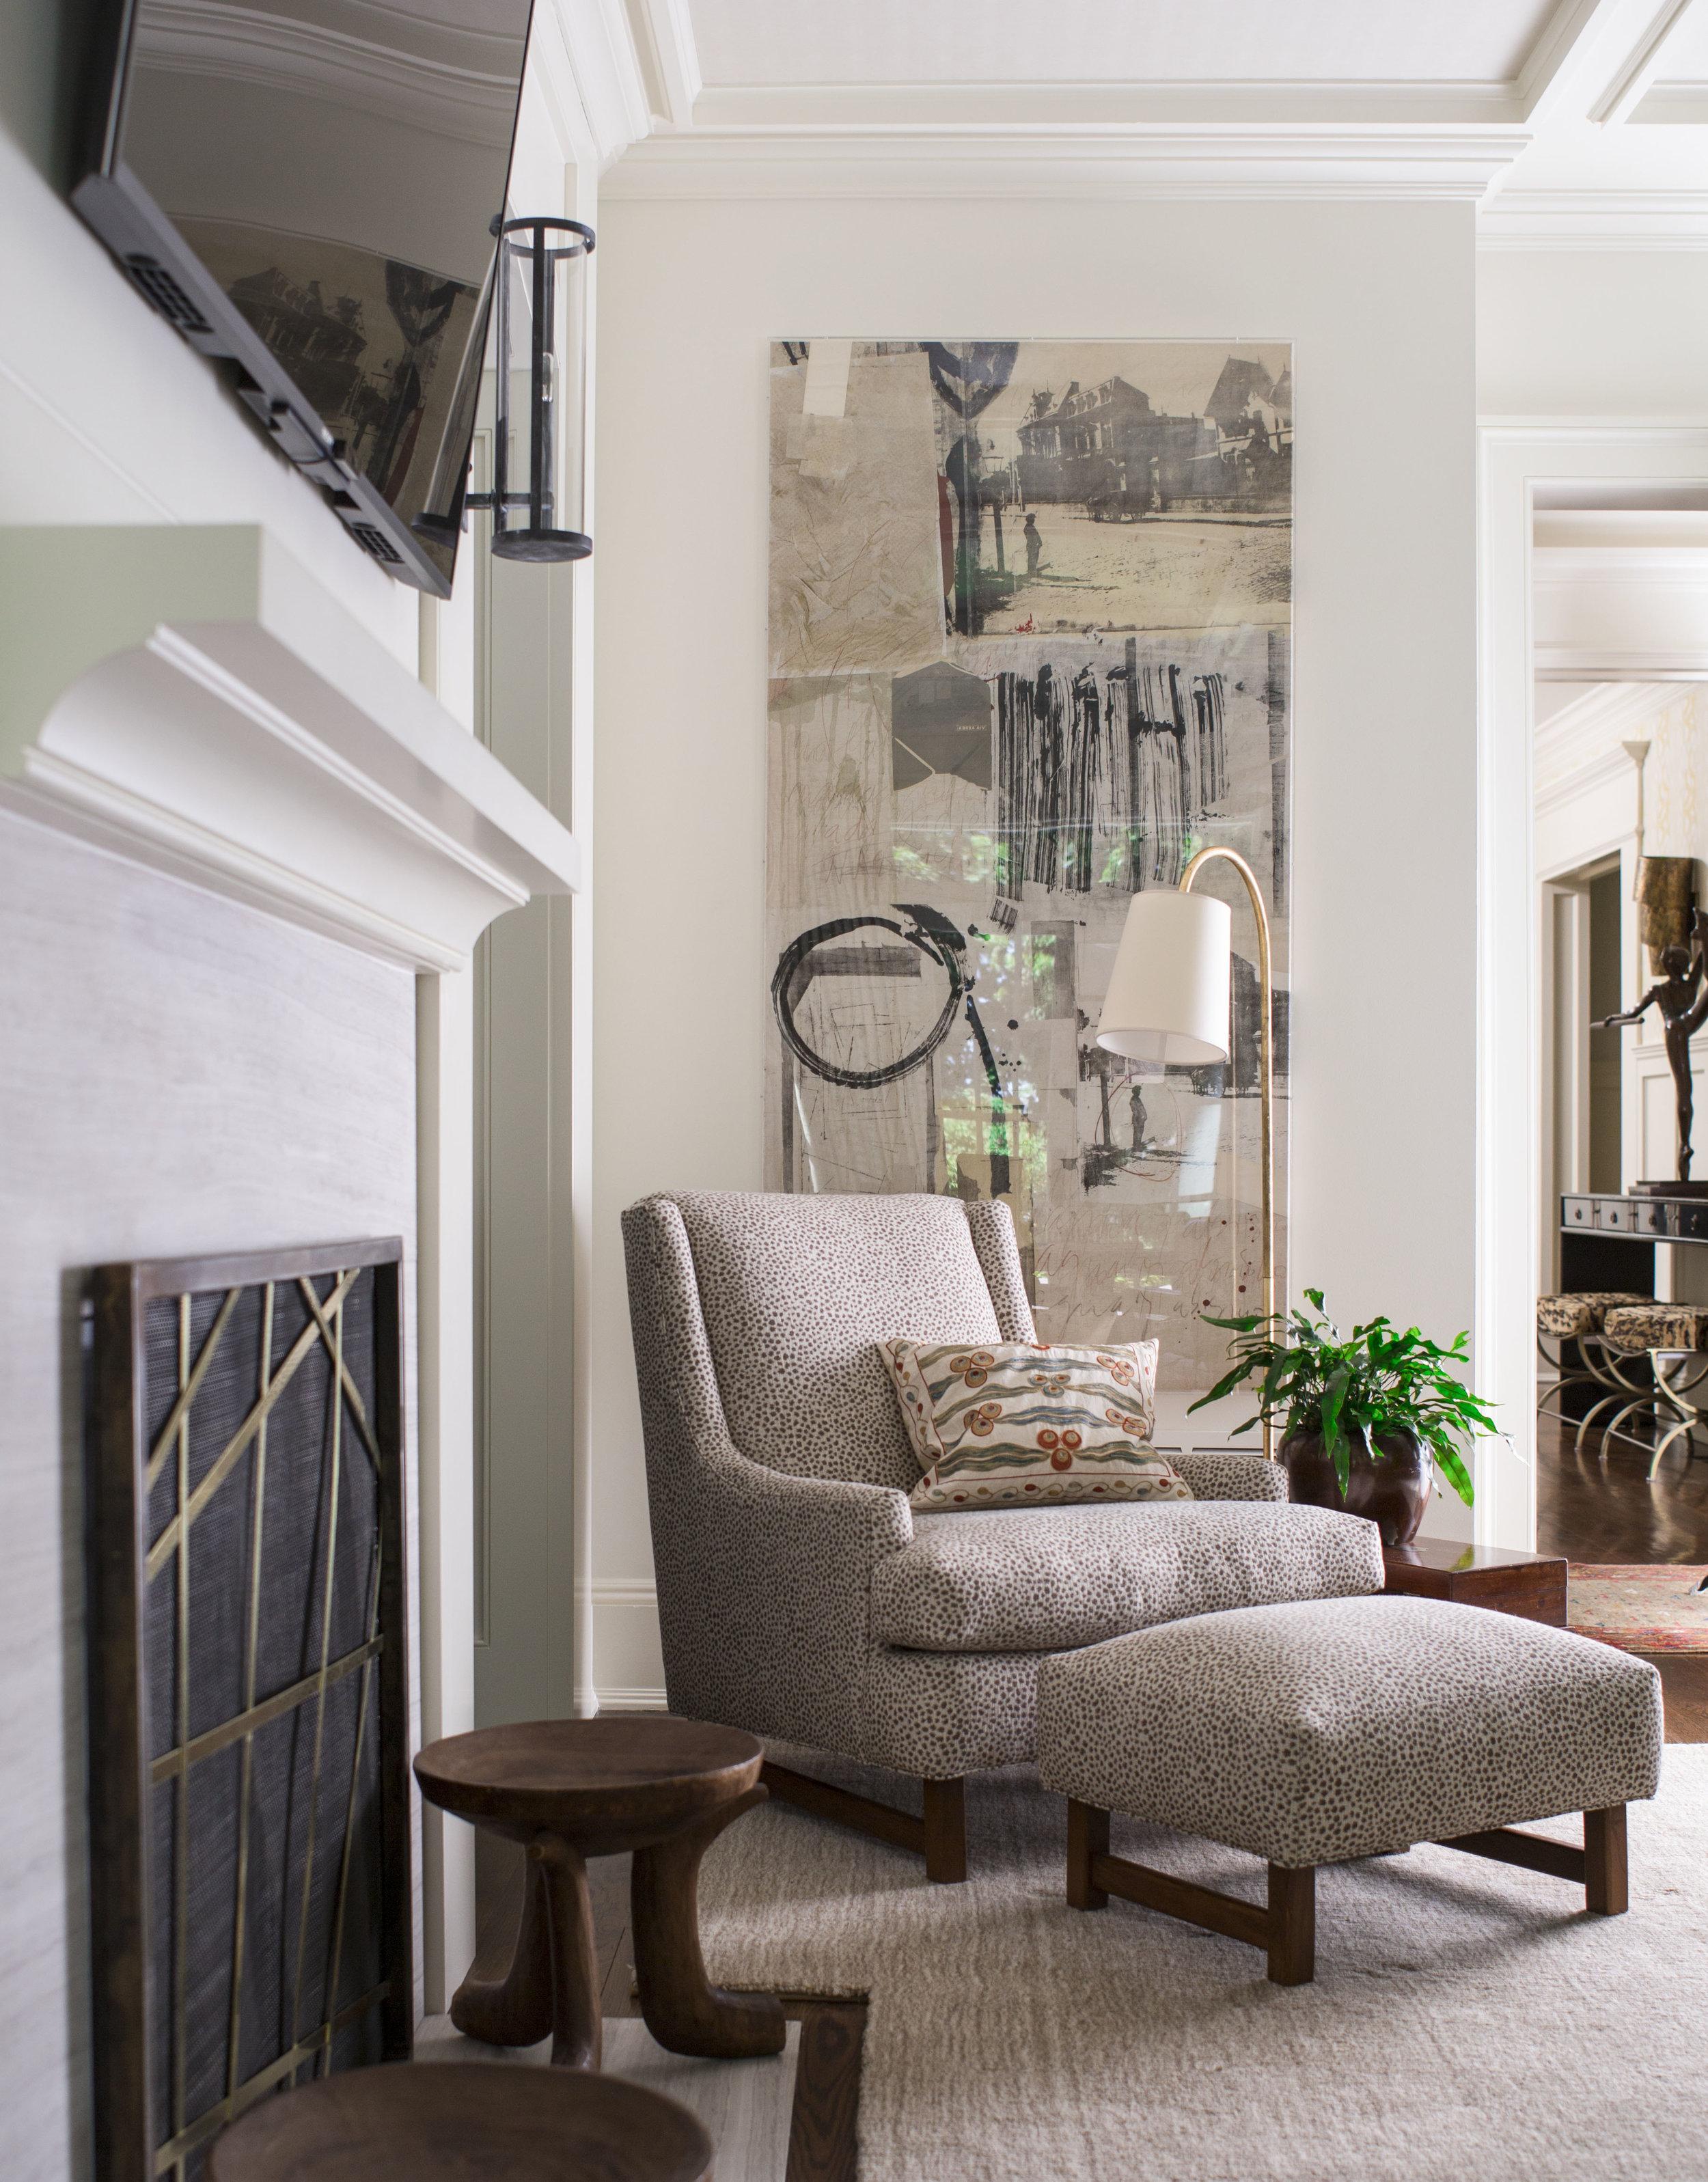 G_Hilderbrand-Interiors_Family_Chair_63284_F.jpg